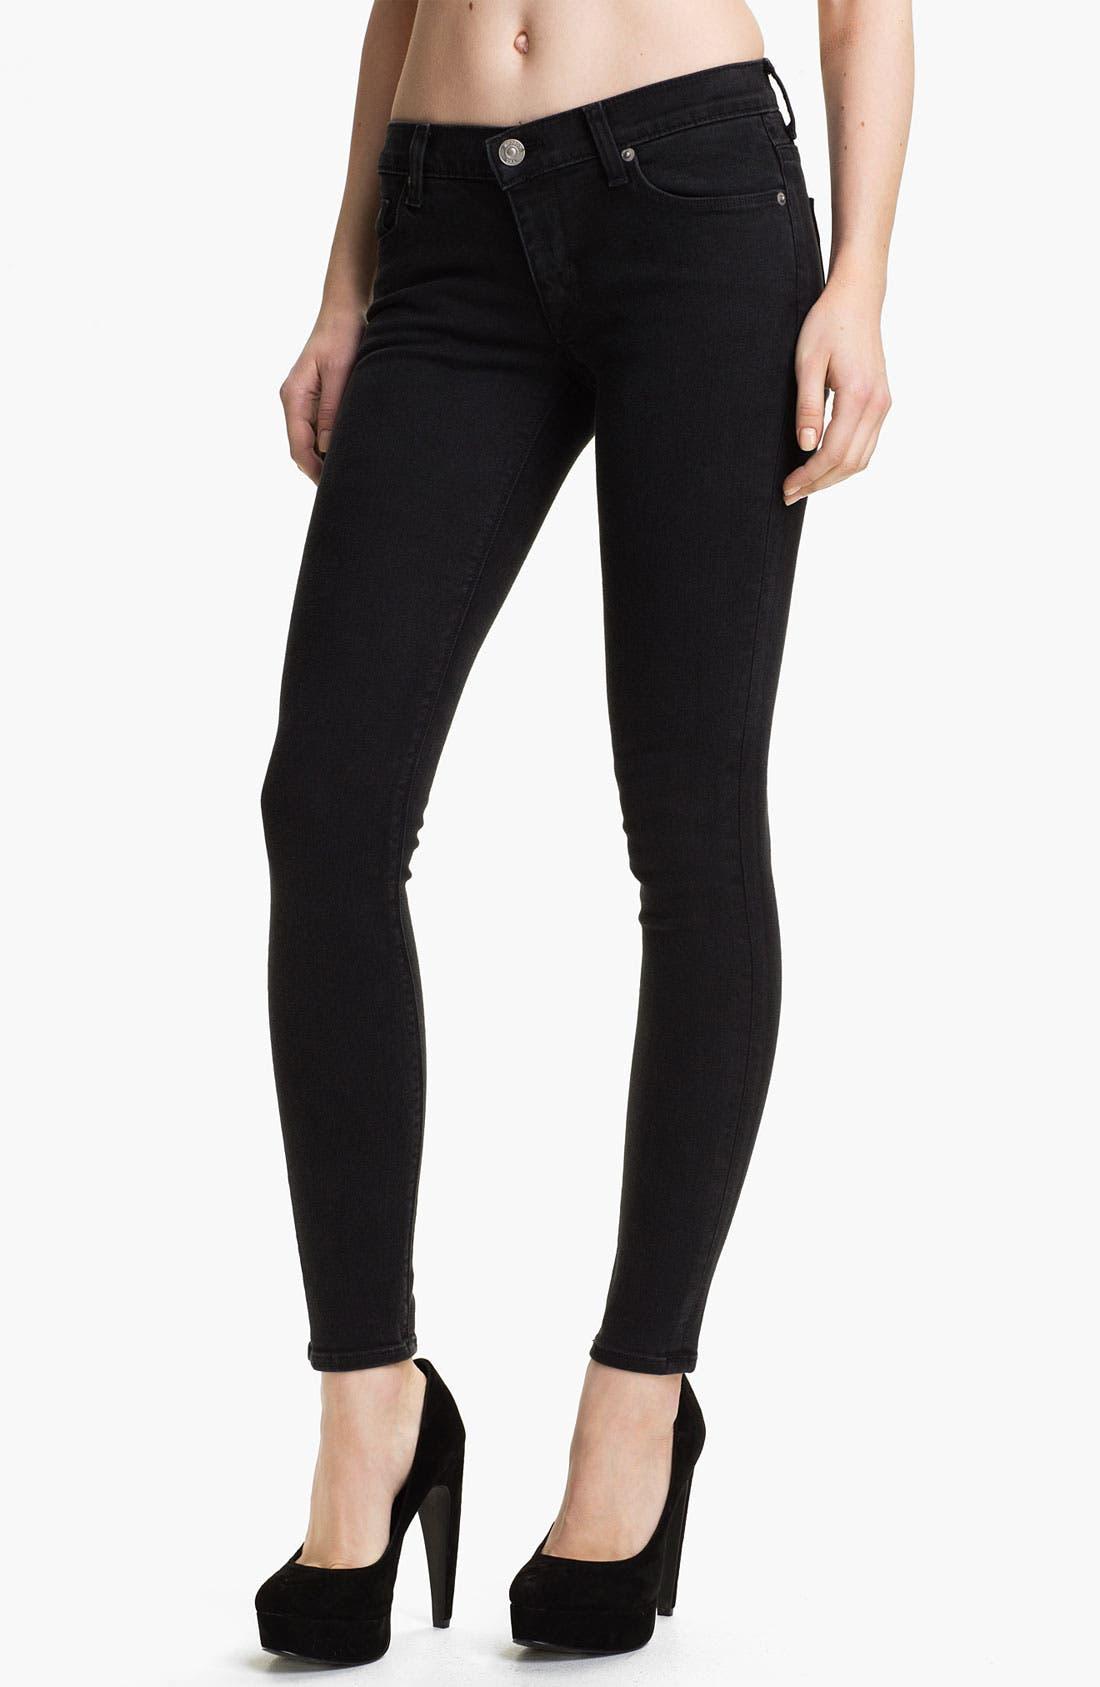 Alternate Image 1 Selected - Hudson Jeans 'Krista' Super Skinny Jeans (Maiden)